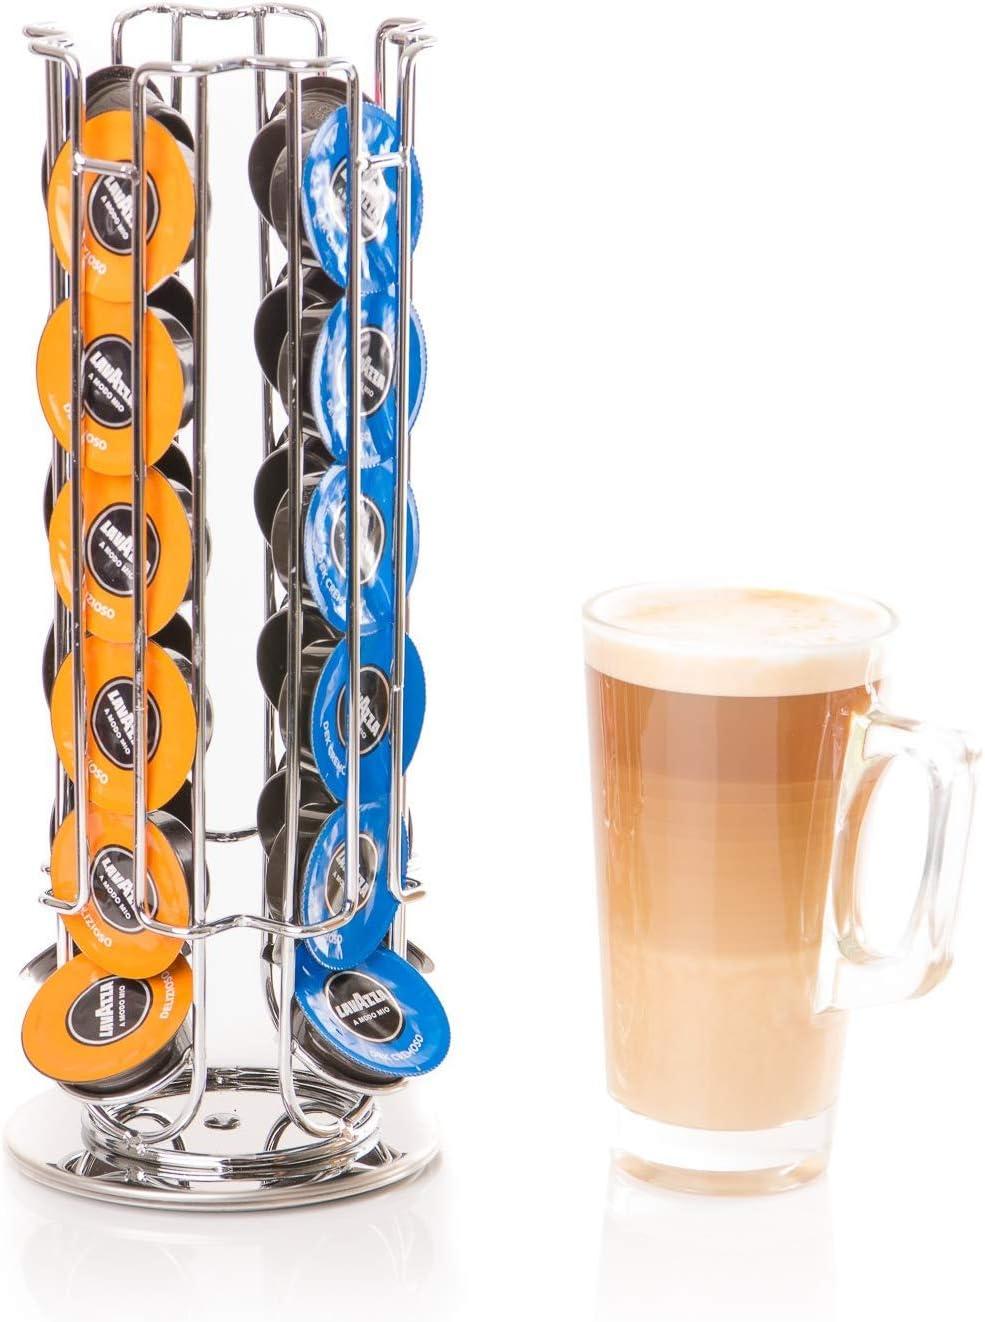 Nespresso /& Dolce Gusto Revolving Coffee Pod Holder Capsule Stand for Tassimo